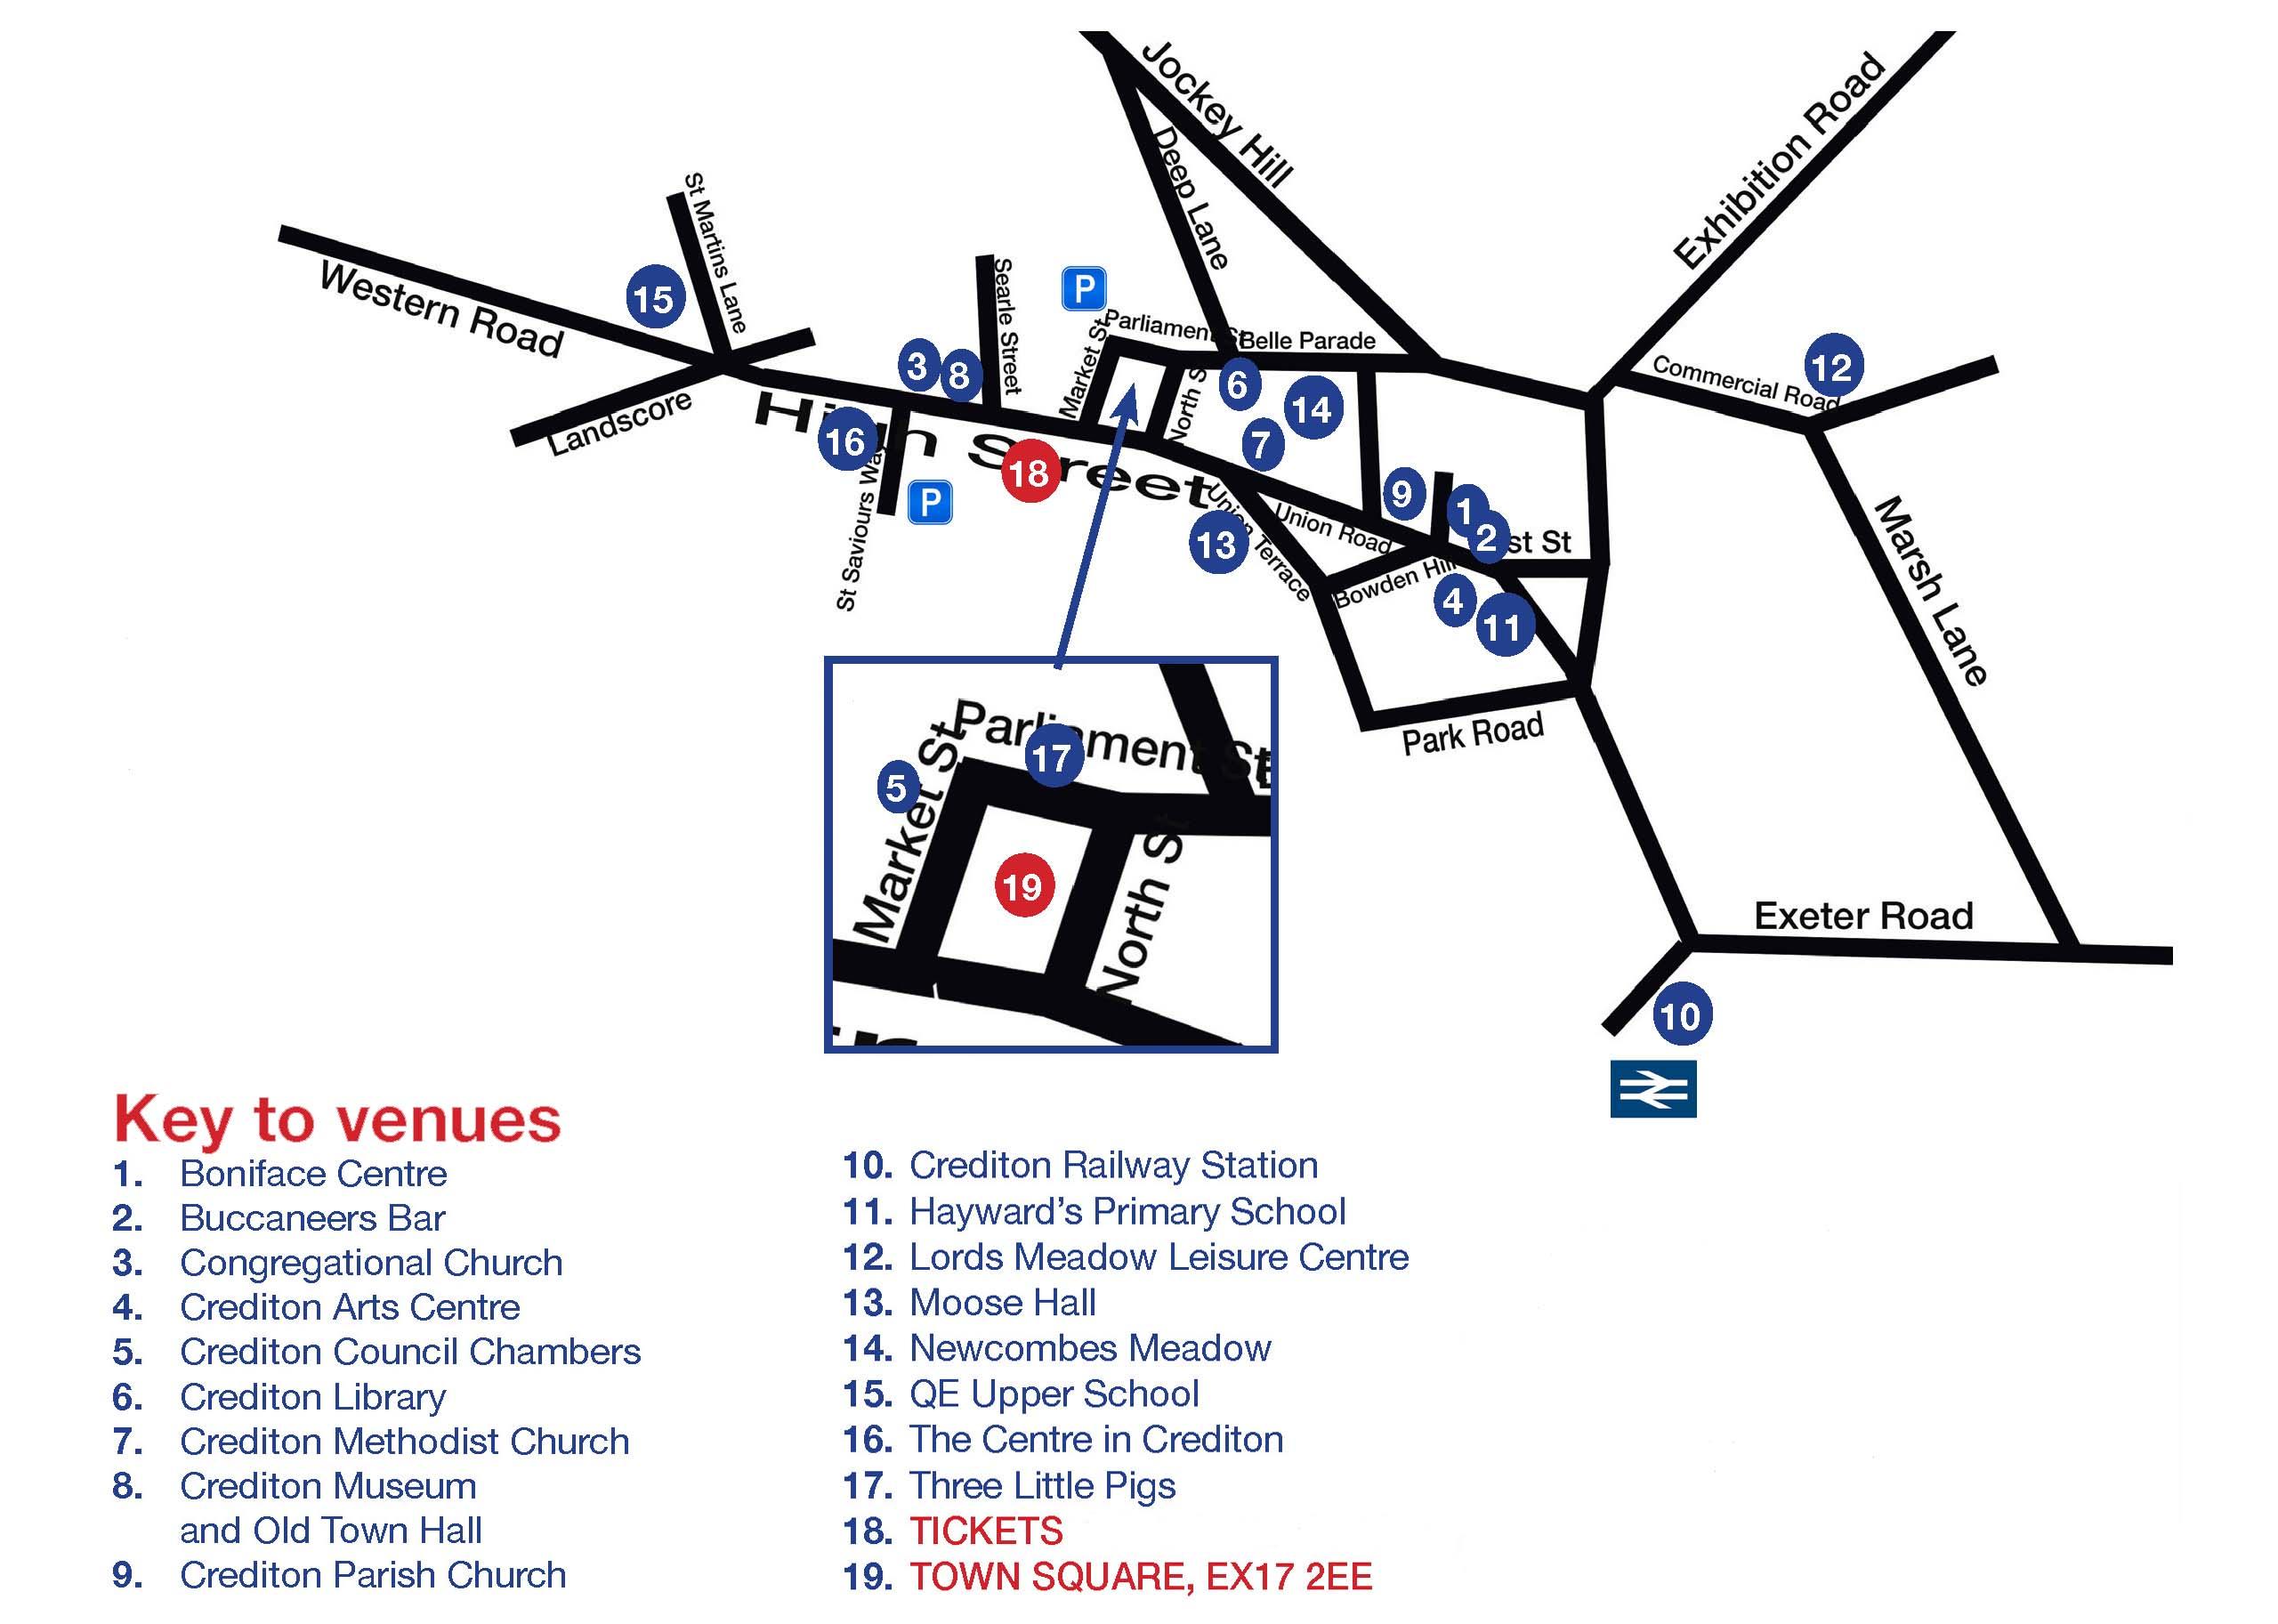 Map of Crediton venues